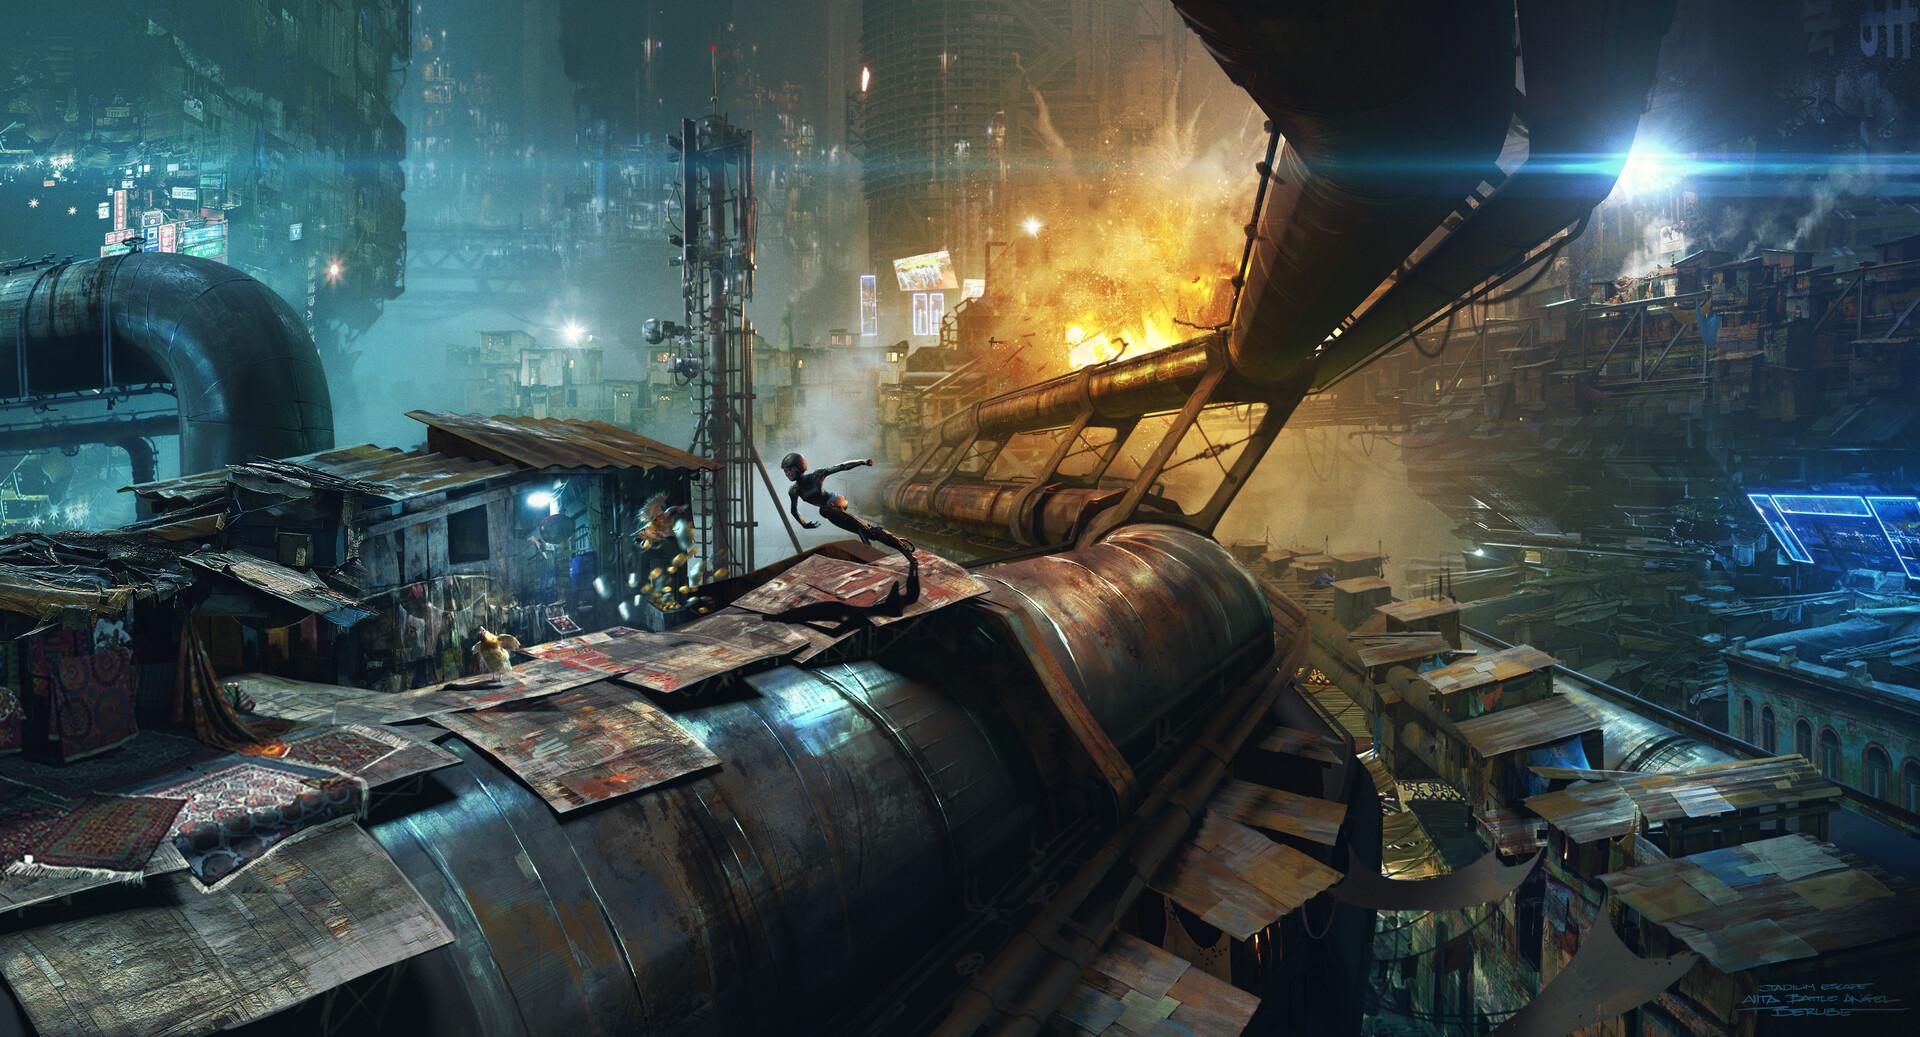 The Sci-Fi Concept Artworks of Jonathan Berube